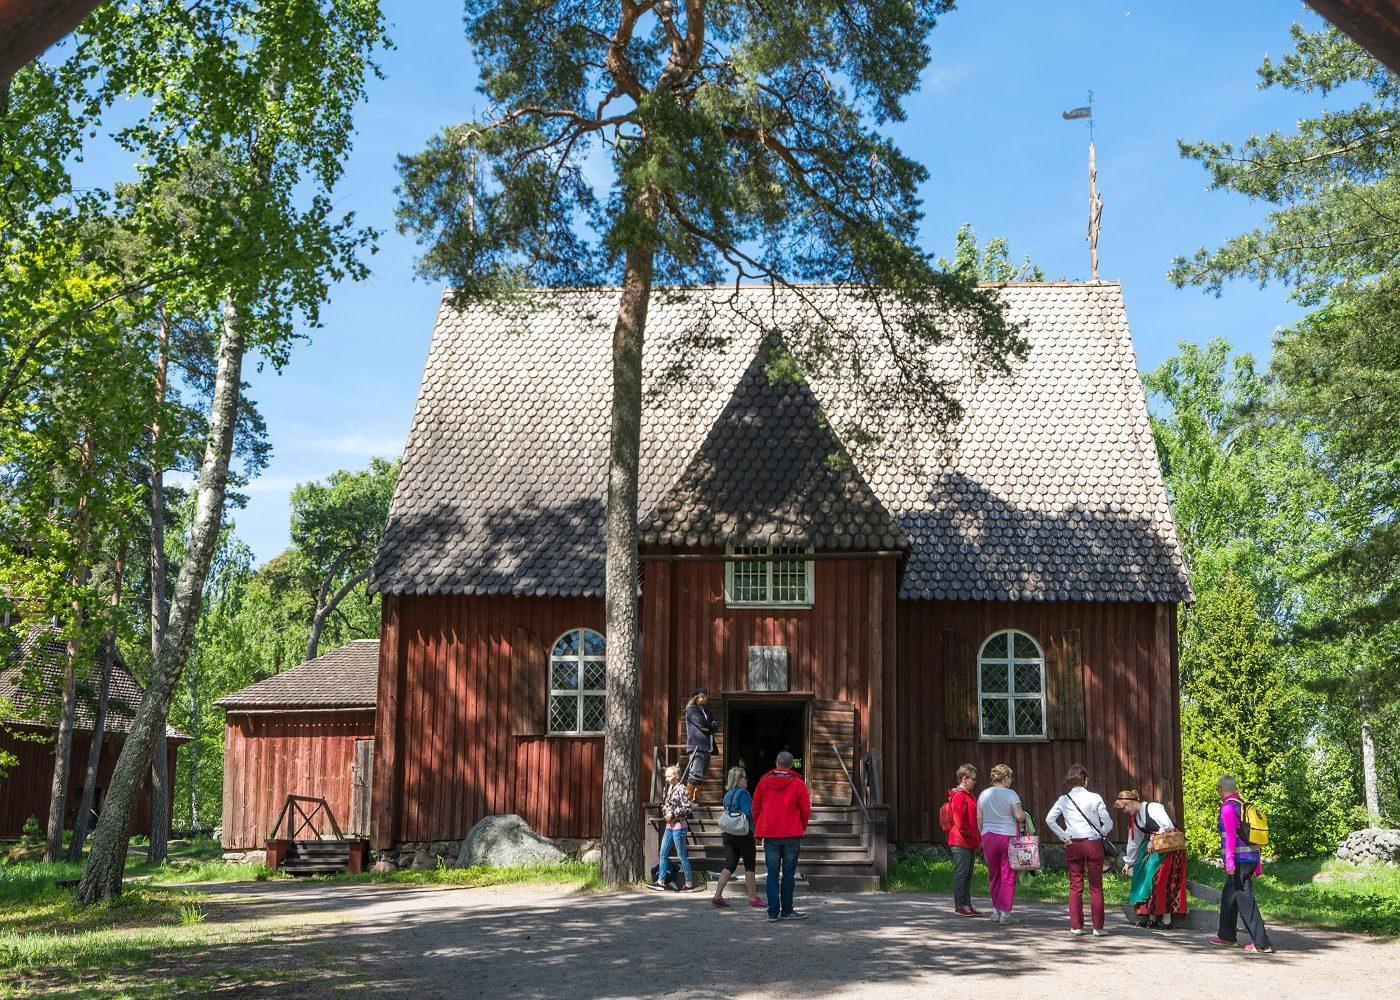 Seurasaaren ulkomuseo, Helsinki